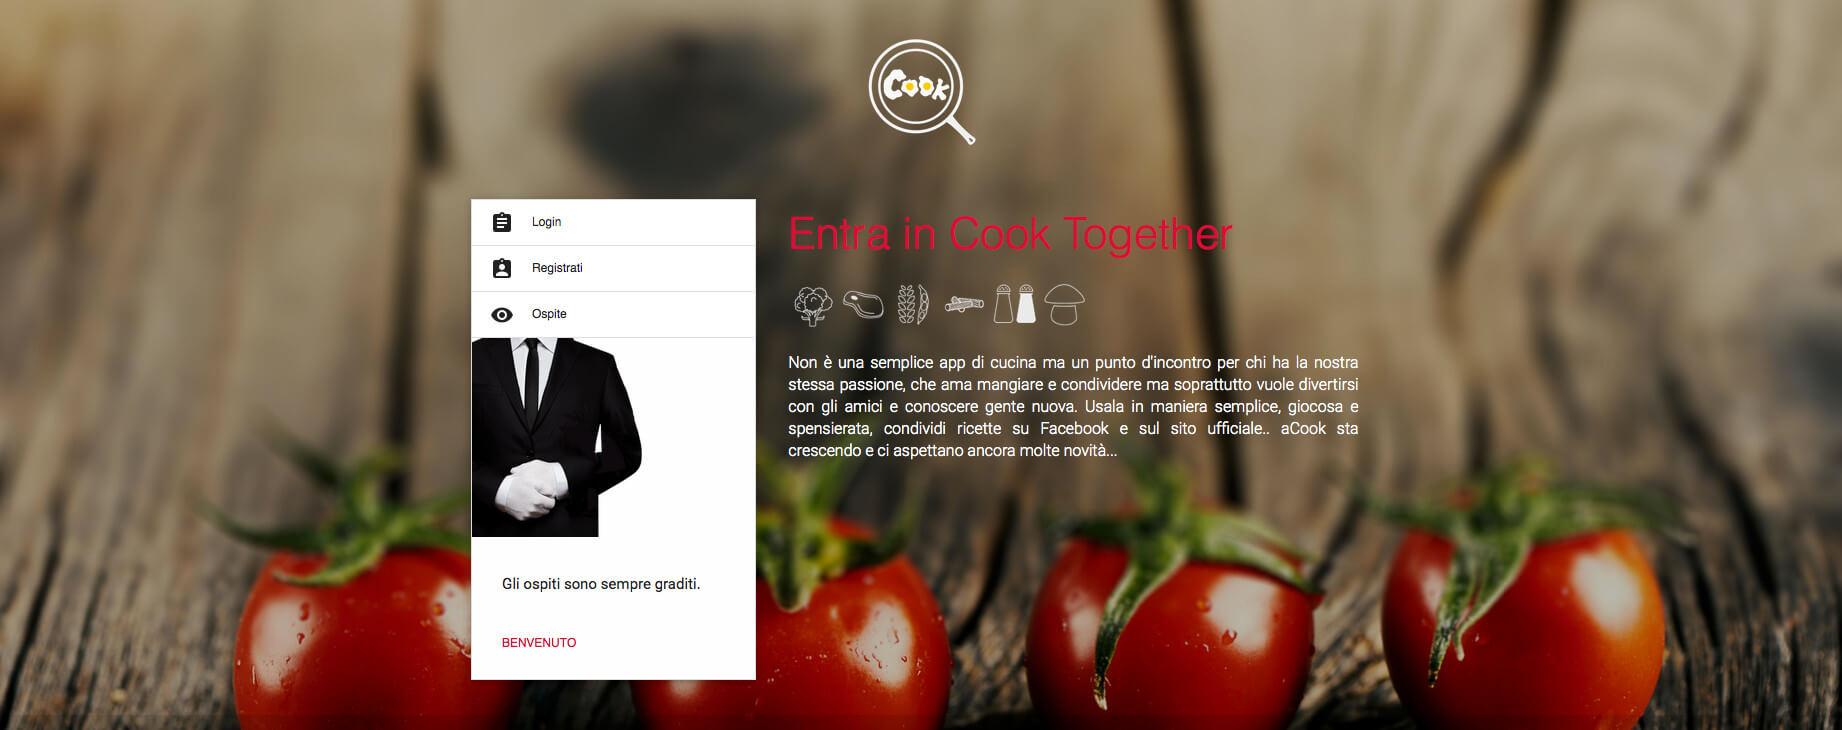 La cucina diventa social con Cook Togheter, scarica l'app per IOS e Android